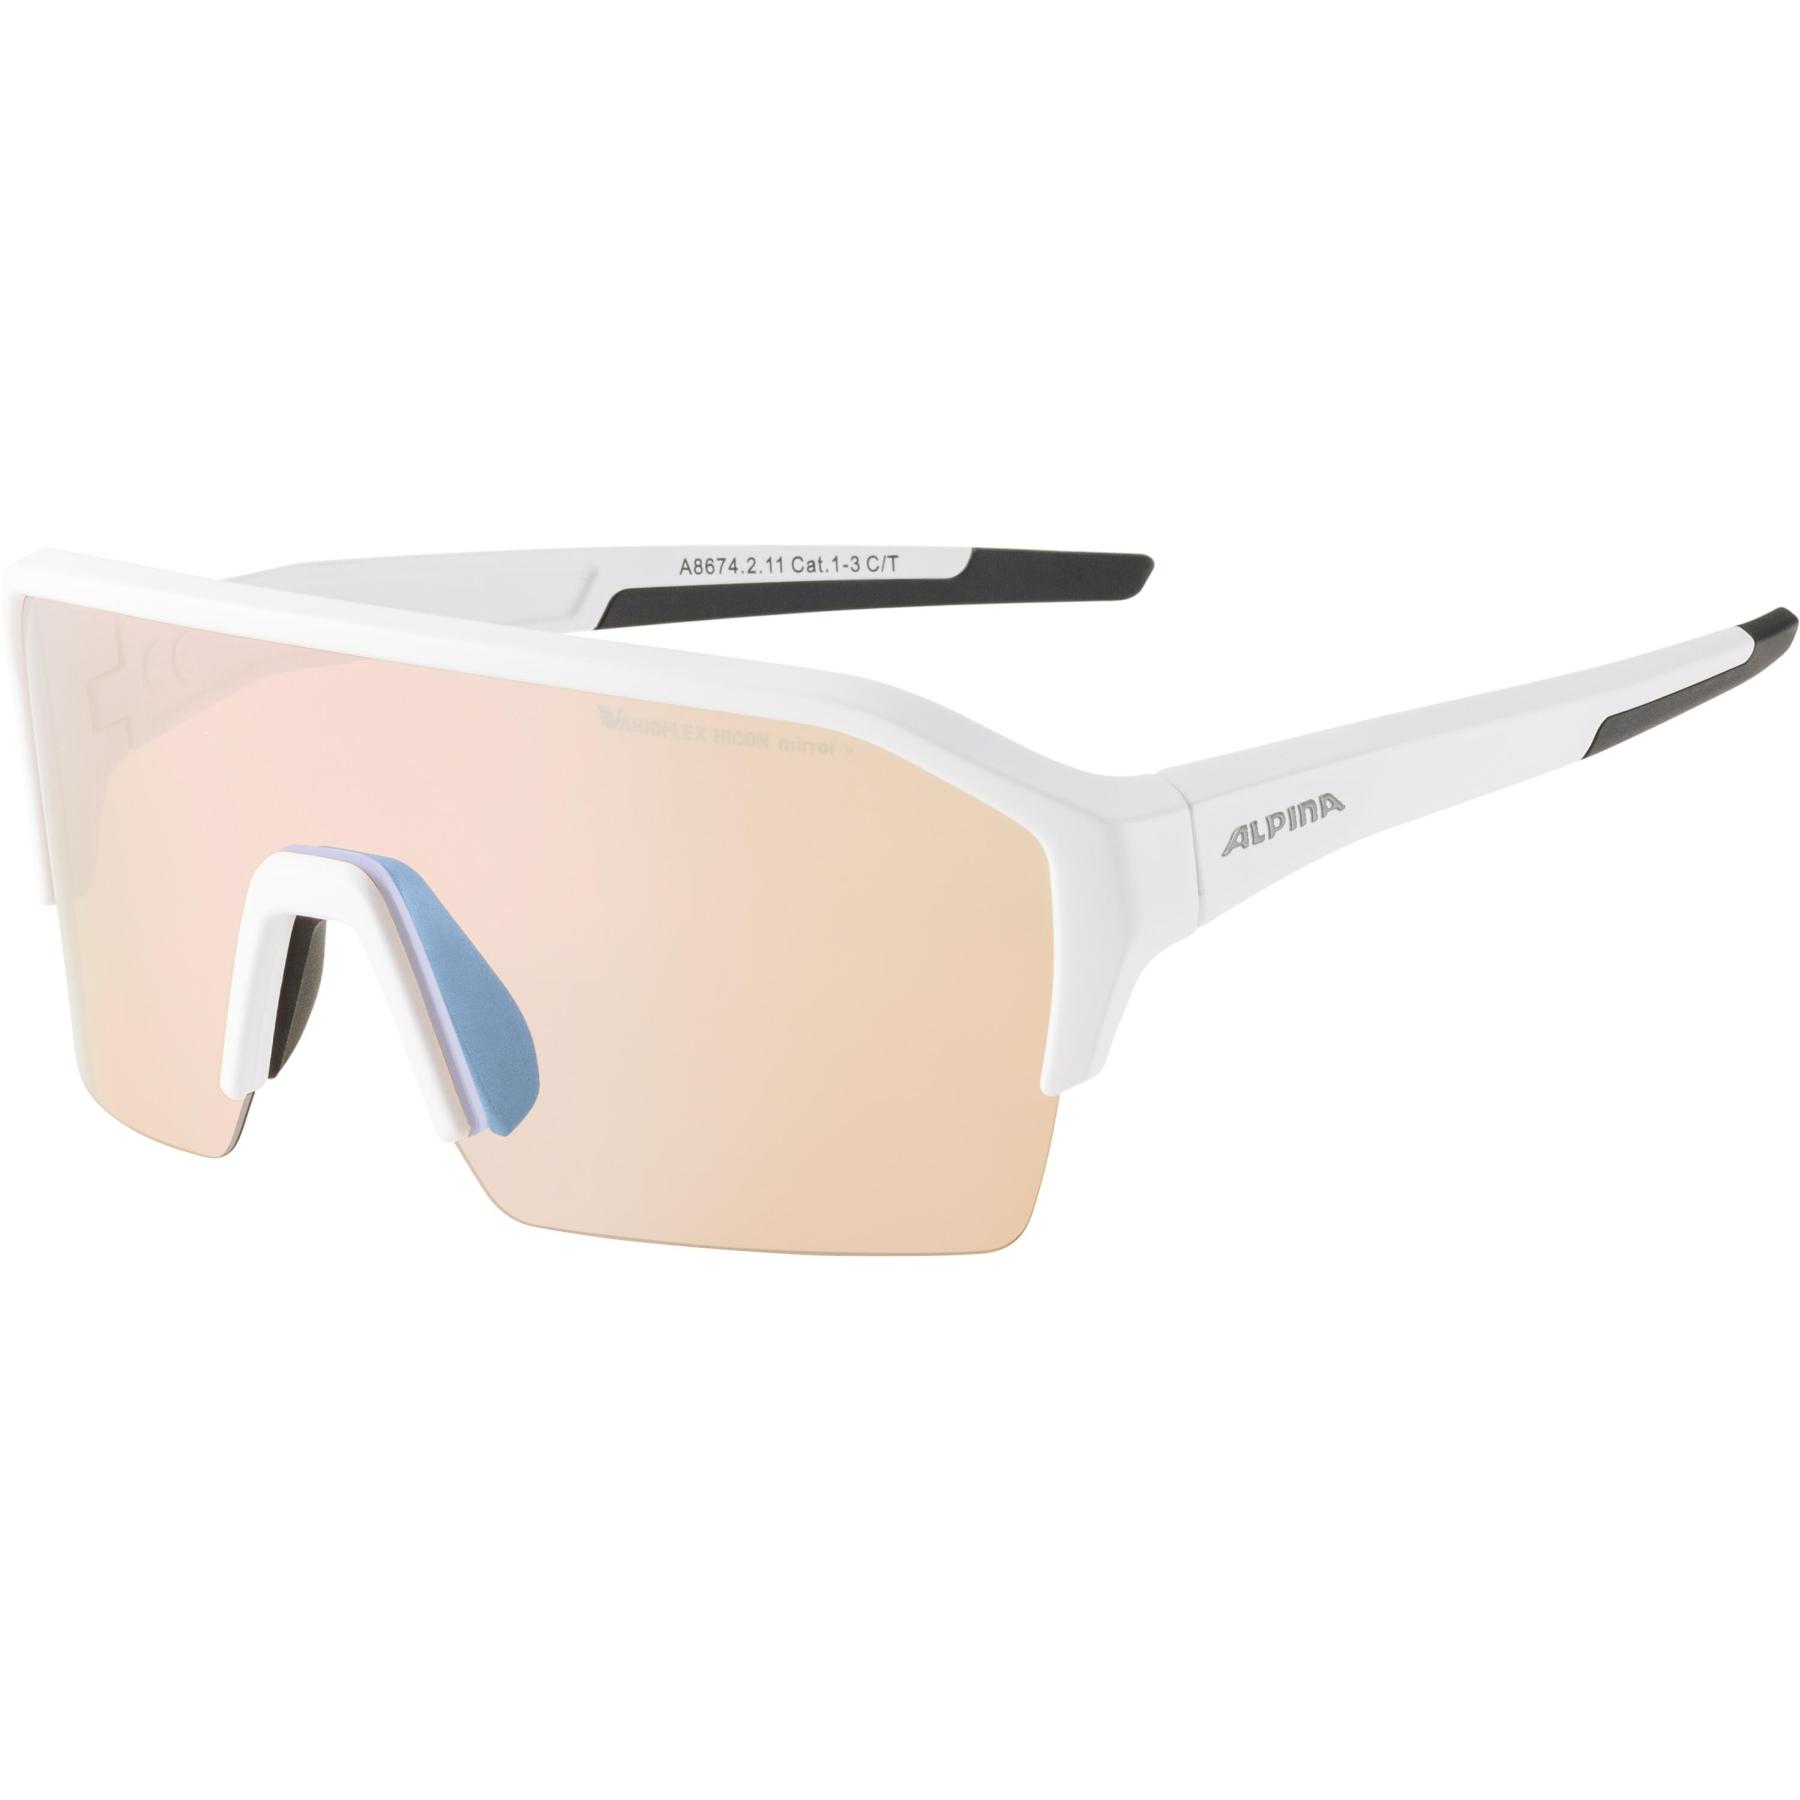 Image of Alpina Ram HR HVLM+ Glasses - white matt / Hicon Varioflex blue mirror